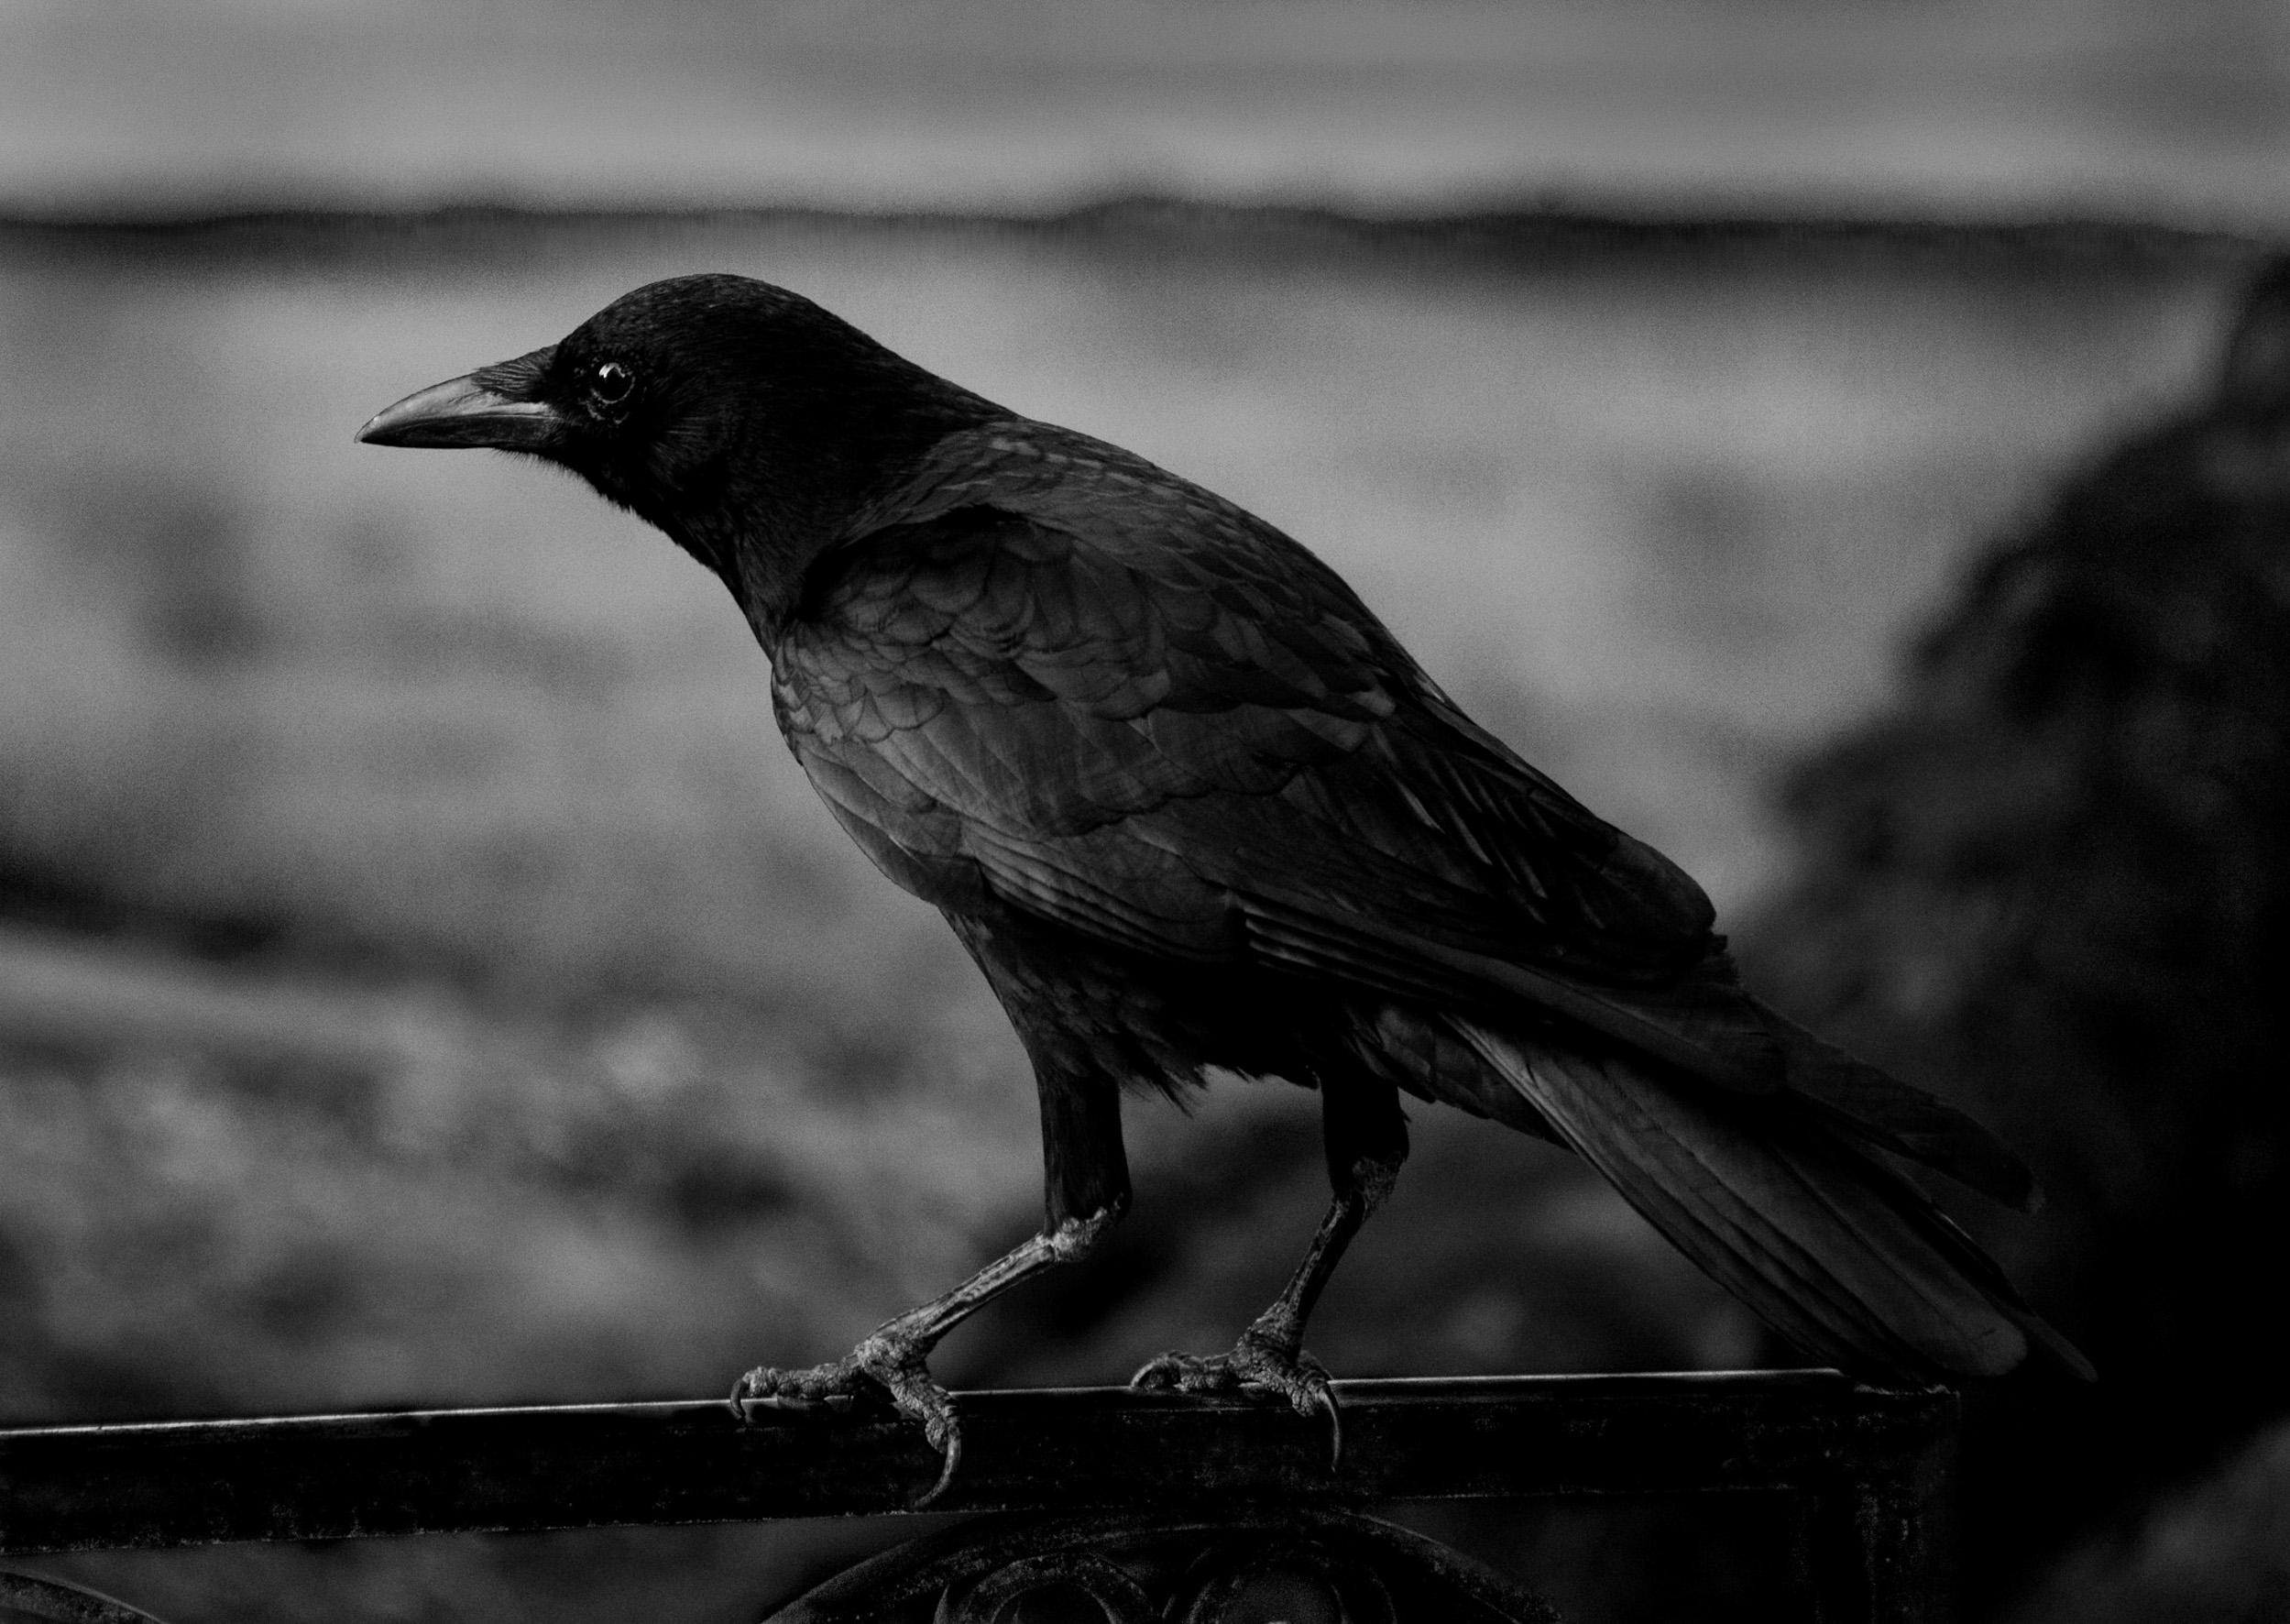 Bird at the Timken Museum, San Diego, California  © Robert Welkie 2018